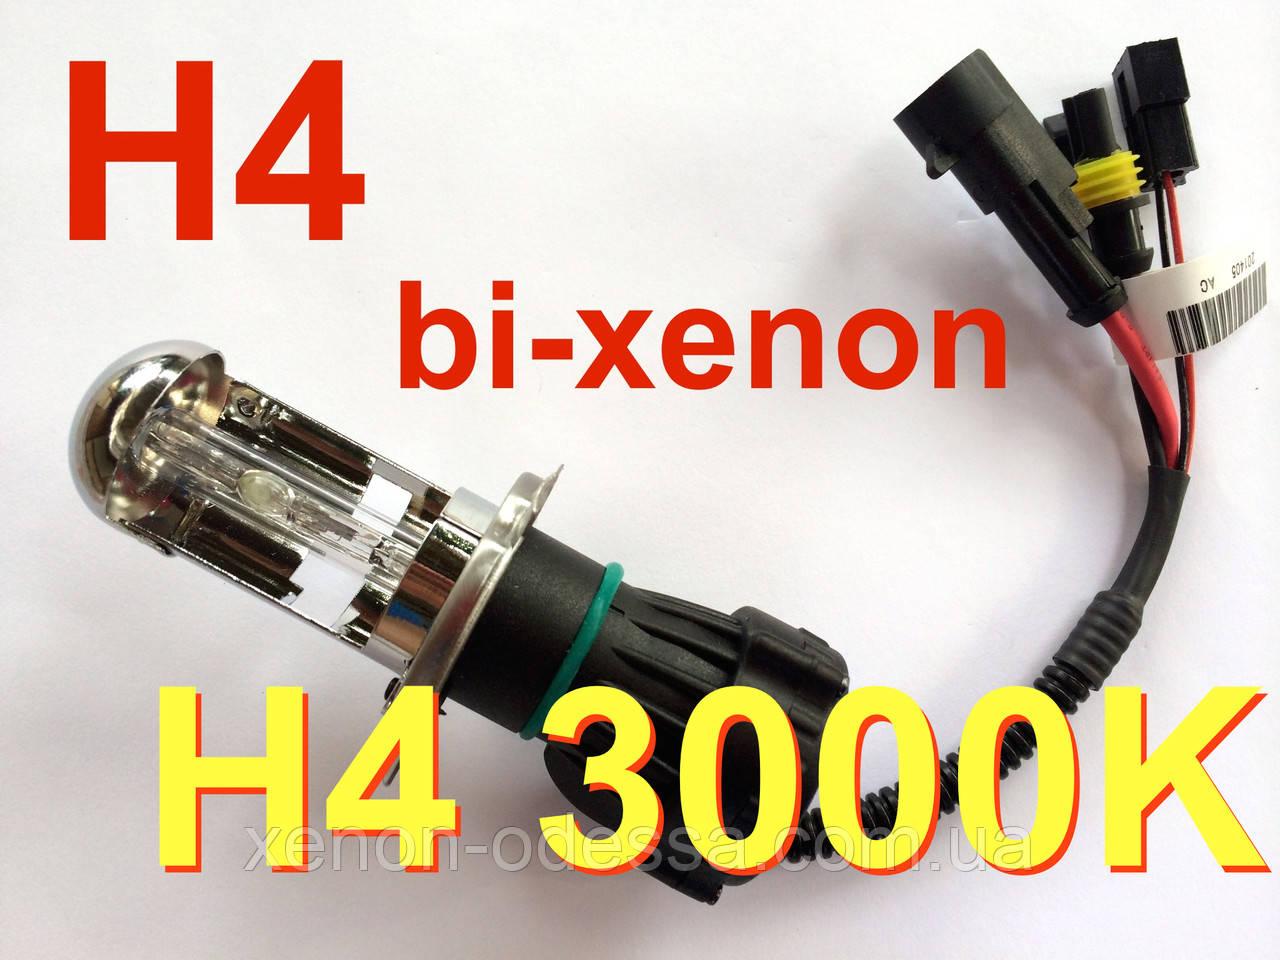 Лампа би-ксенон H4 3000 DС